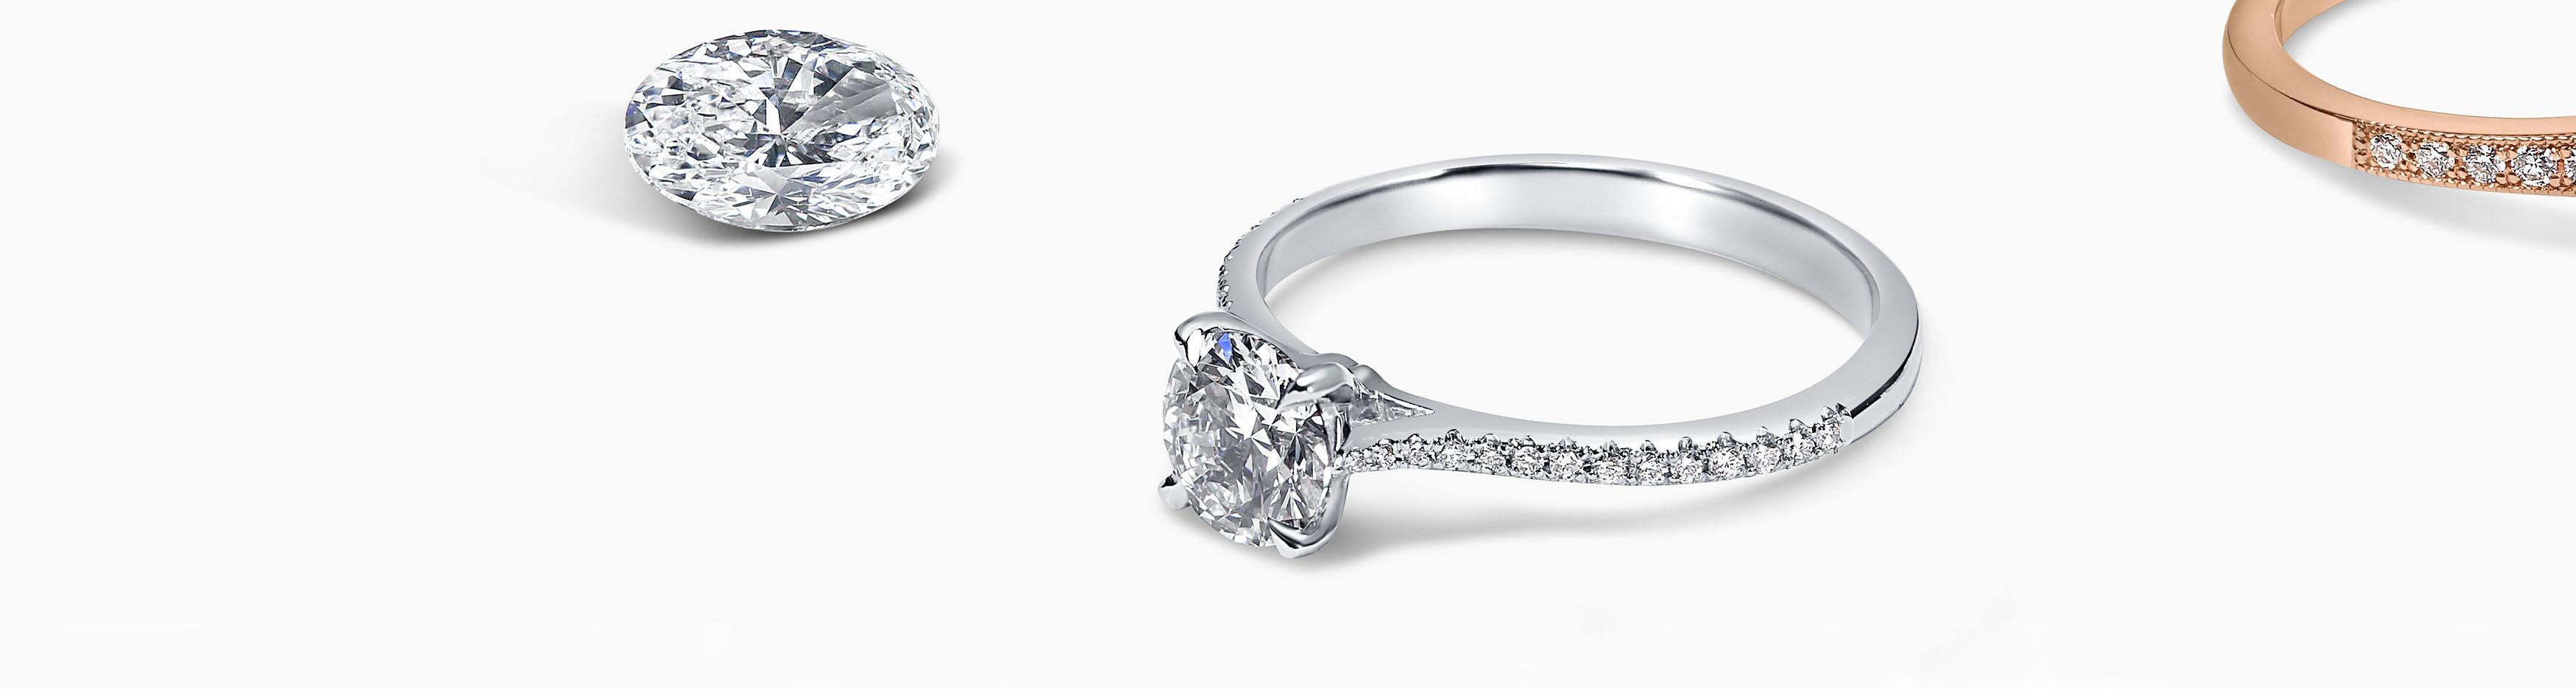 7 Carat Diamond Ring